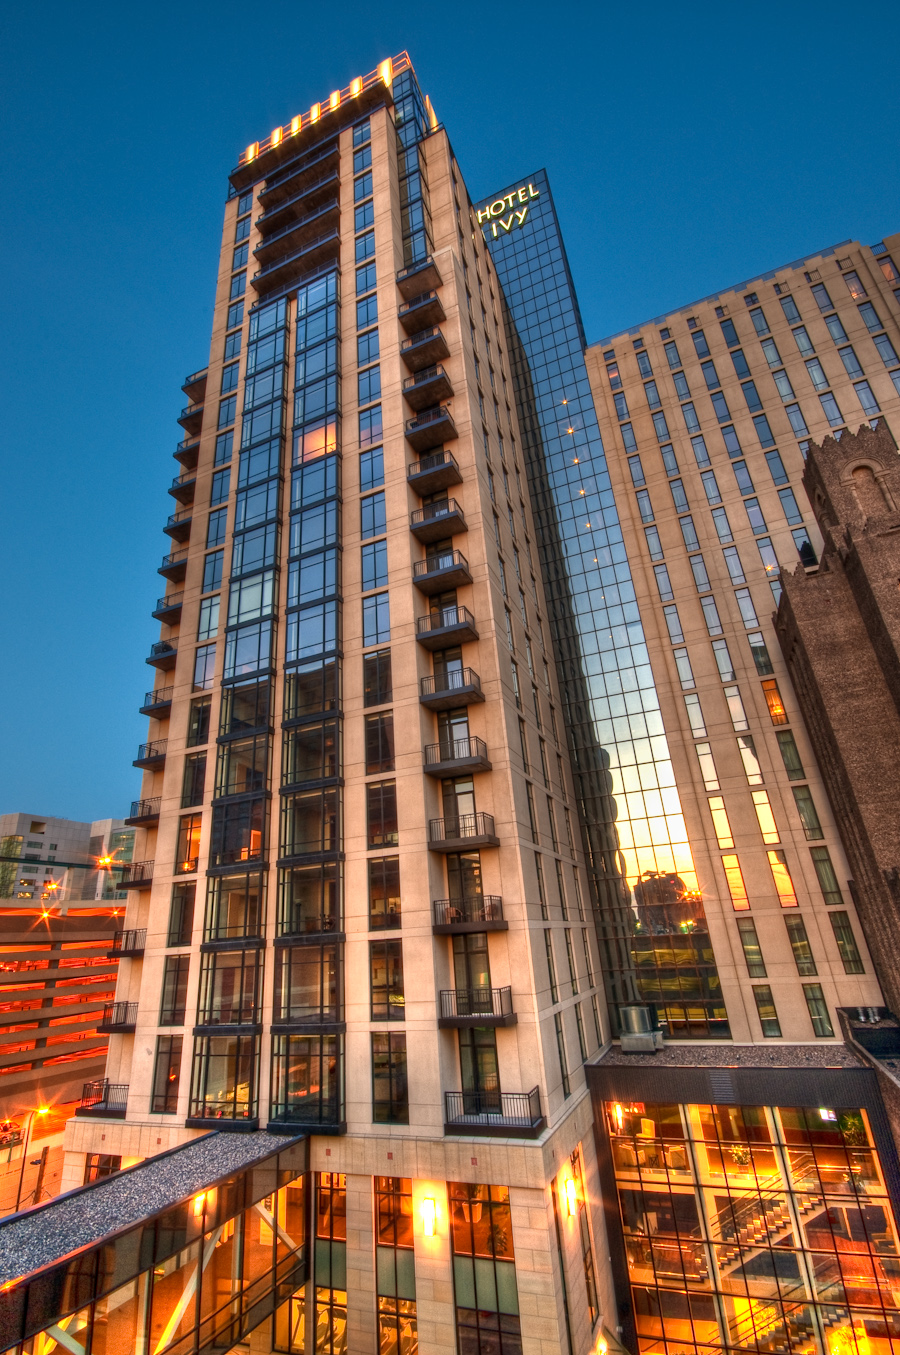 Hotel Ivy Downtown Minneapolis Skyline